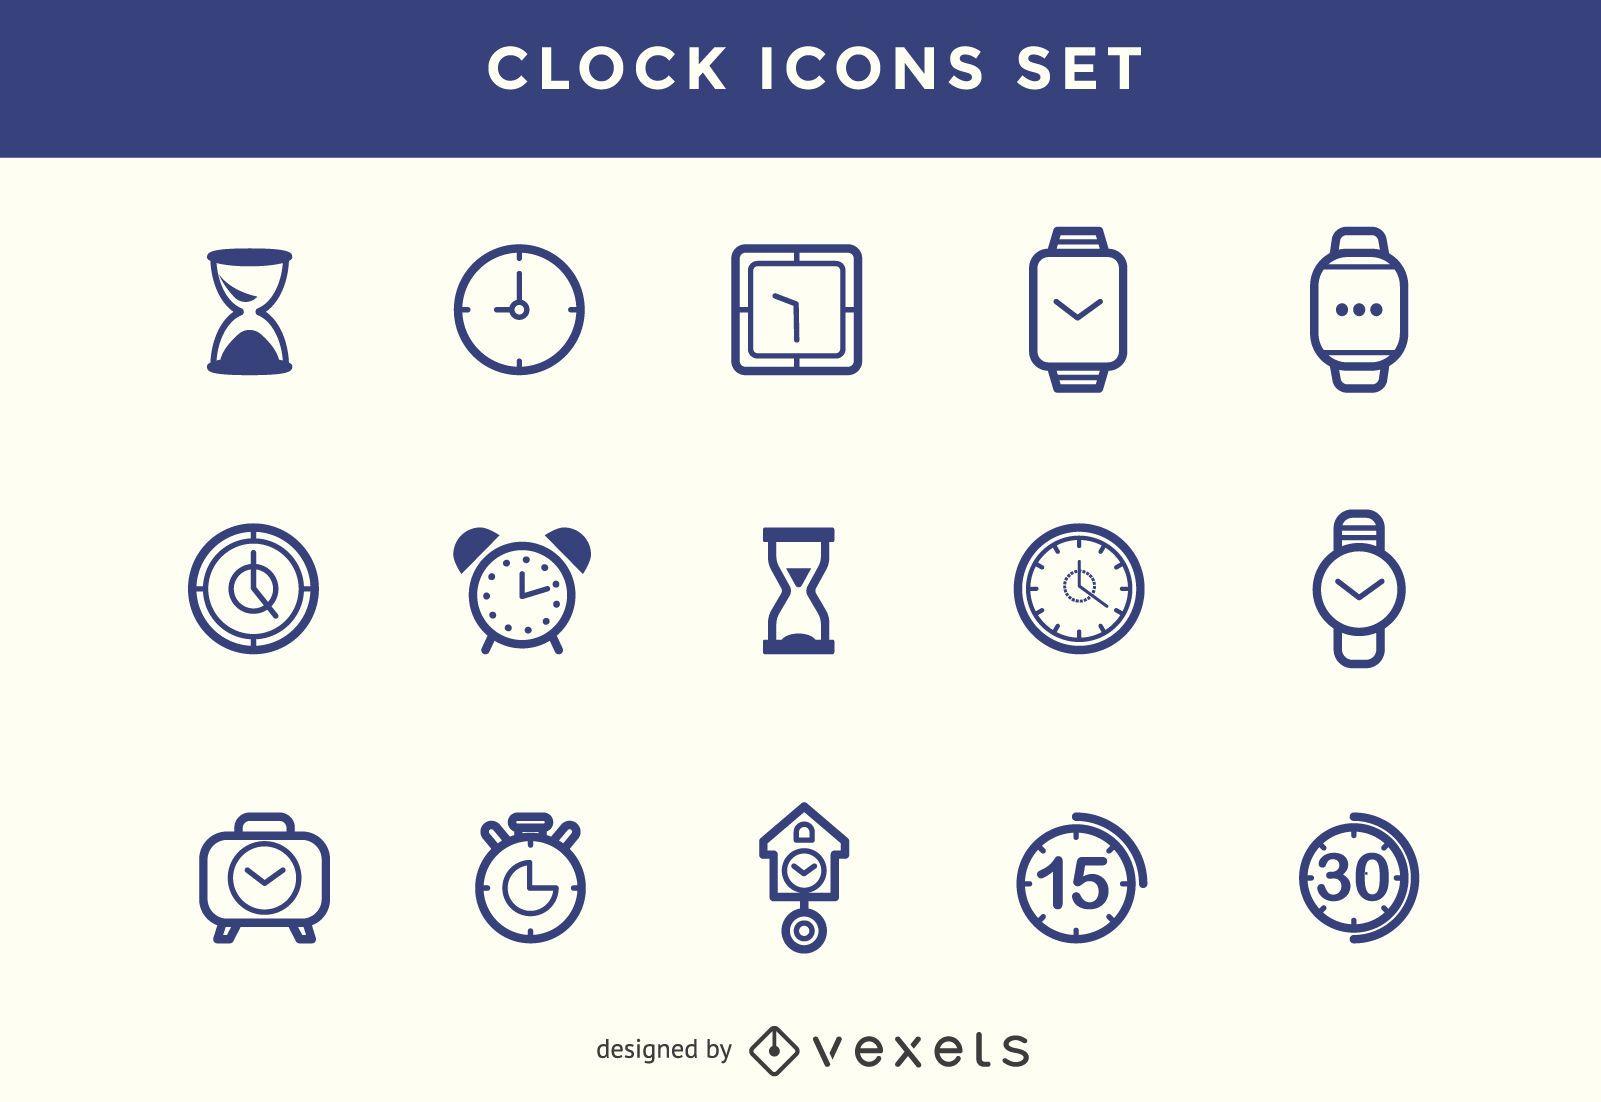 Stroke clock icons set